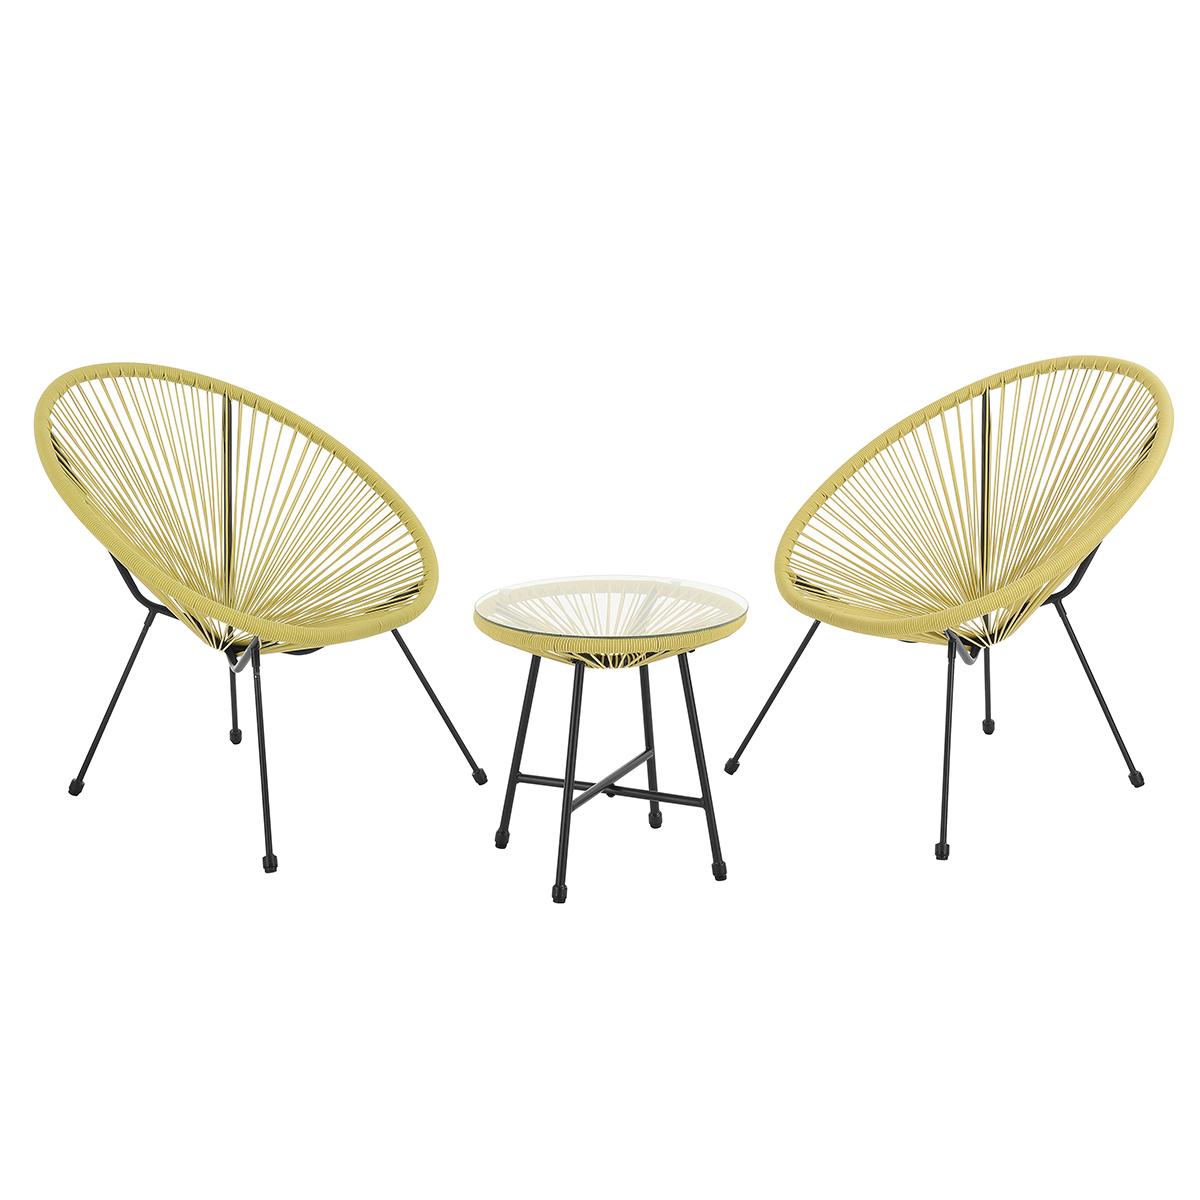 92255 SVITA BALI Balkon-Möbel 3-tlg. Polyrattan Lounge-Set Balkon-Set Gelb